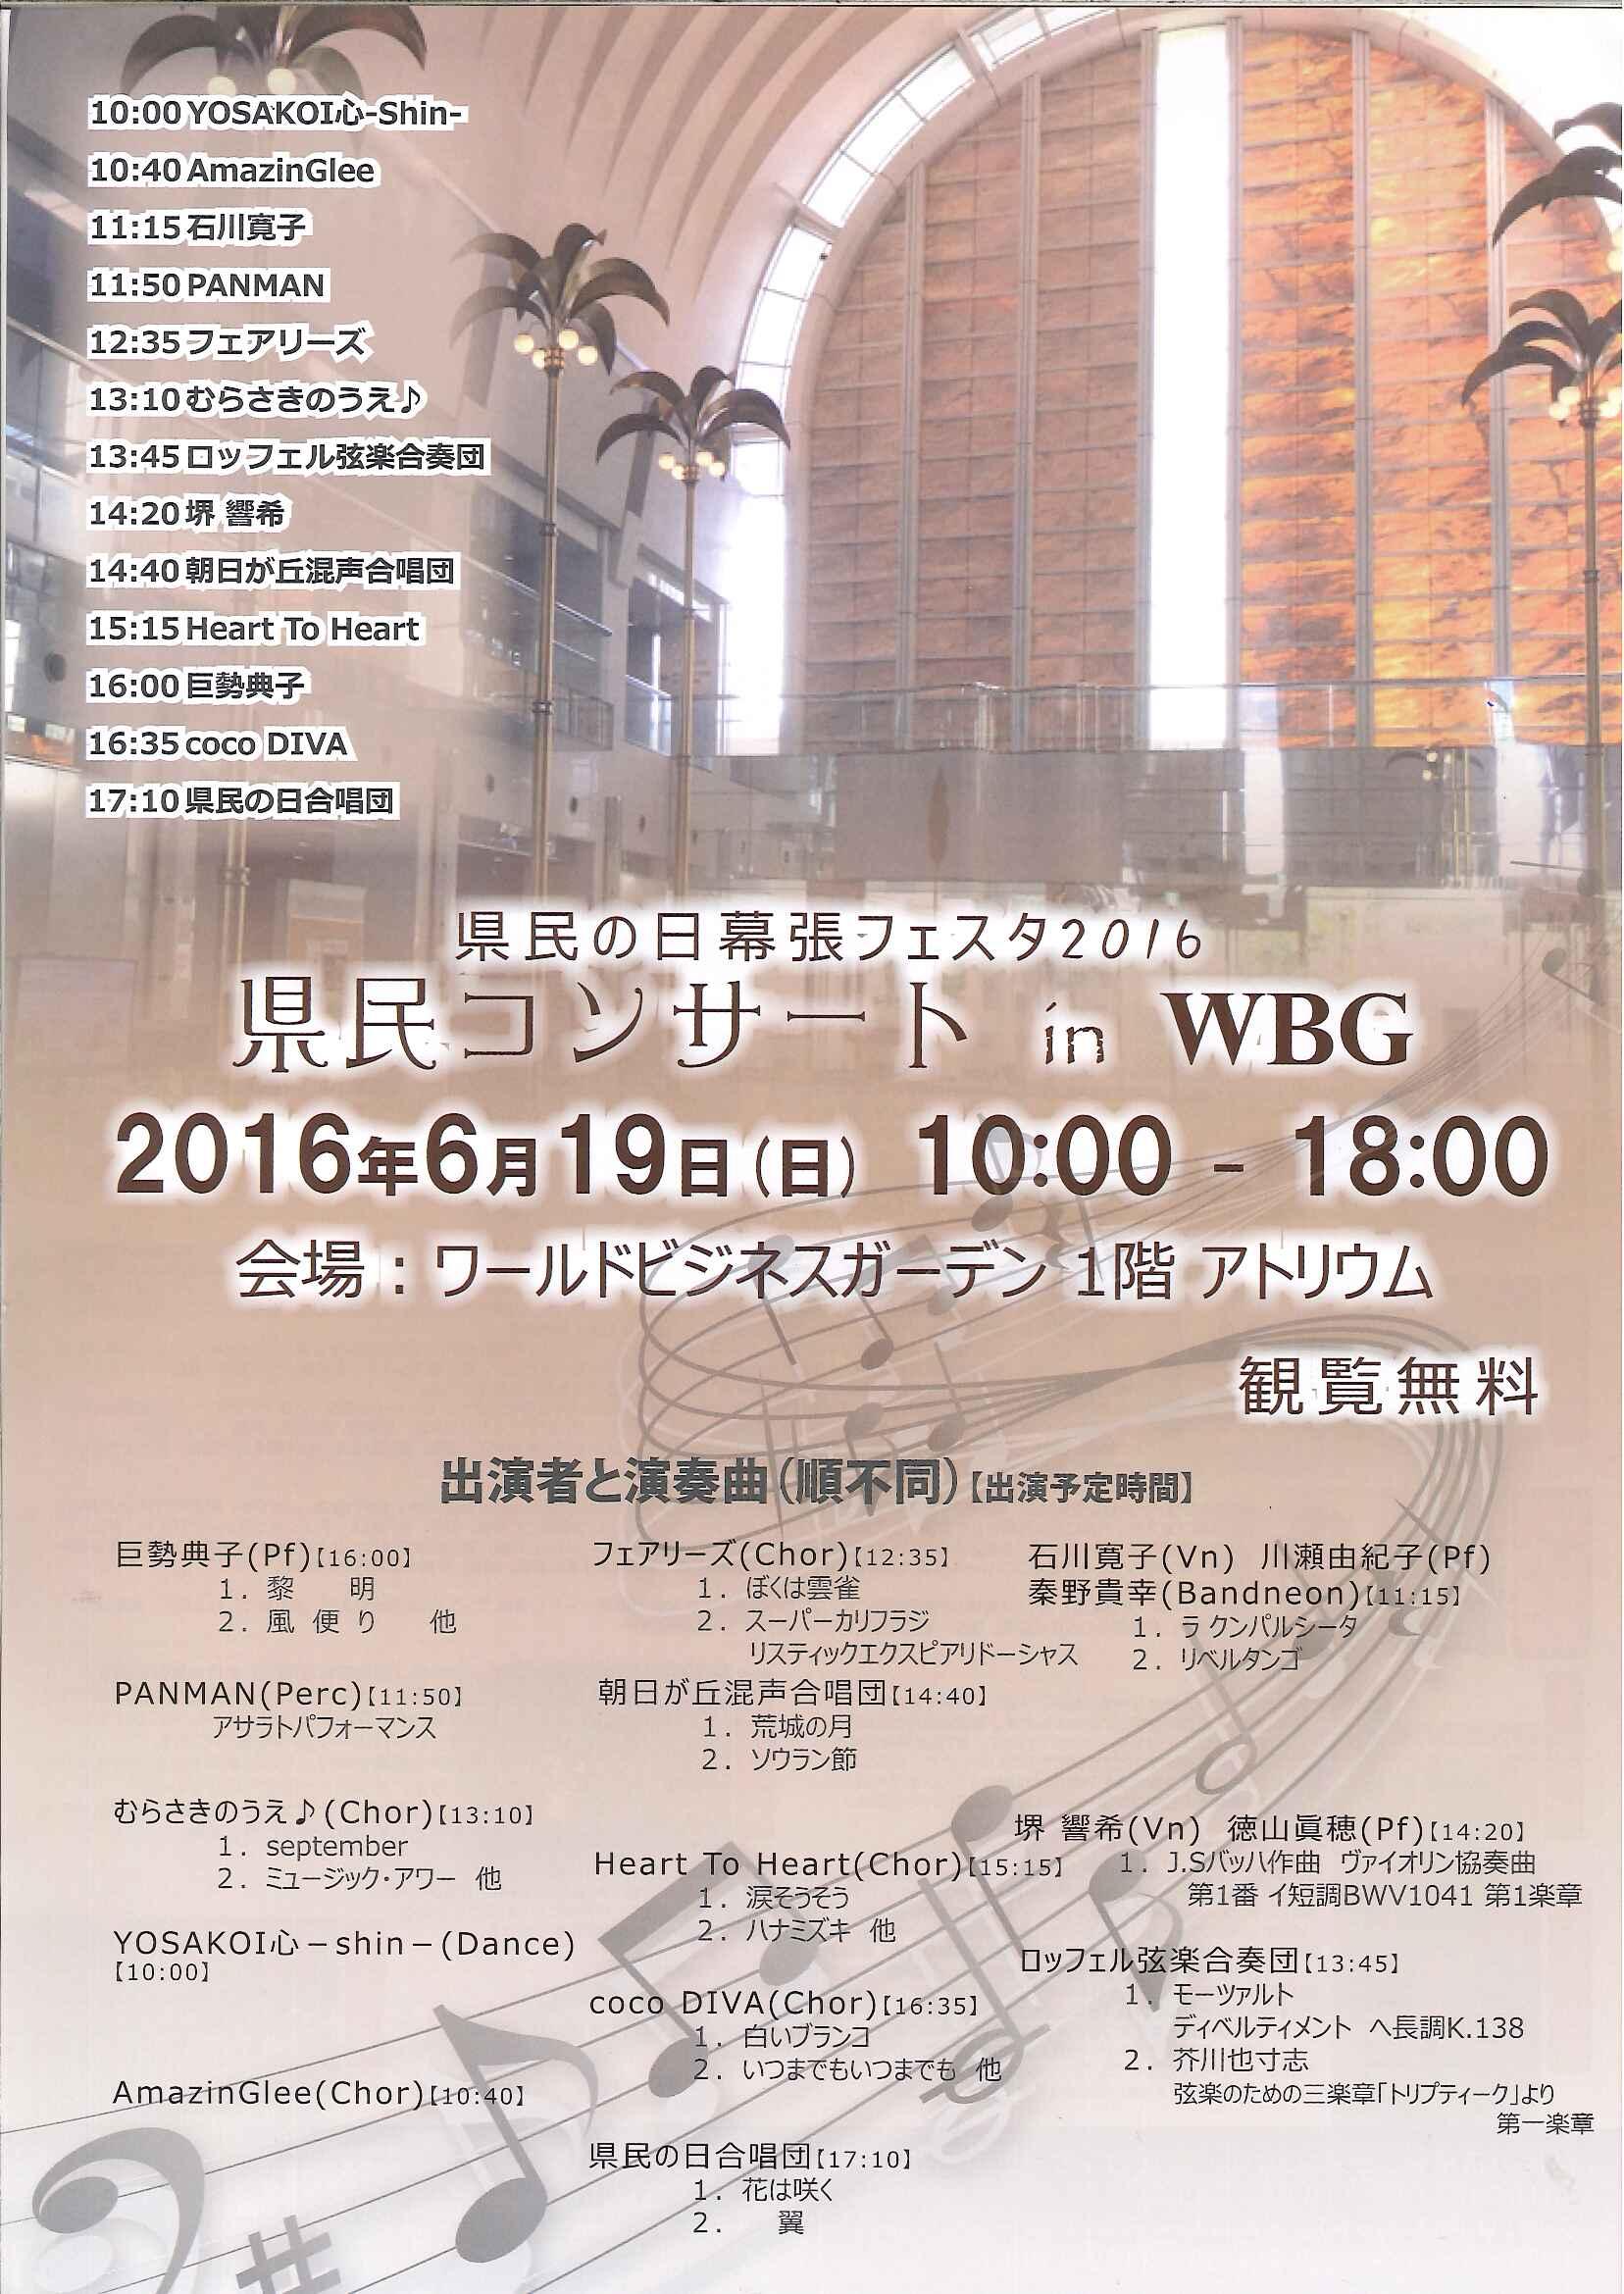 201605241010_0001-1